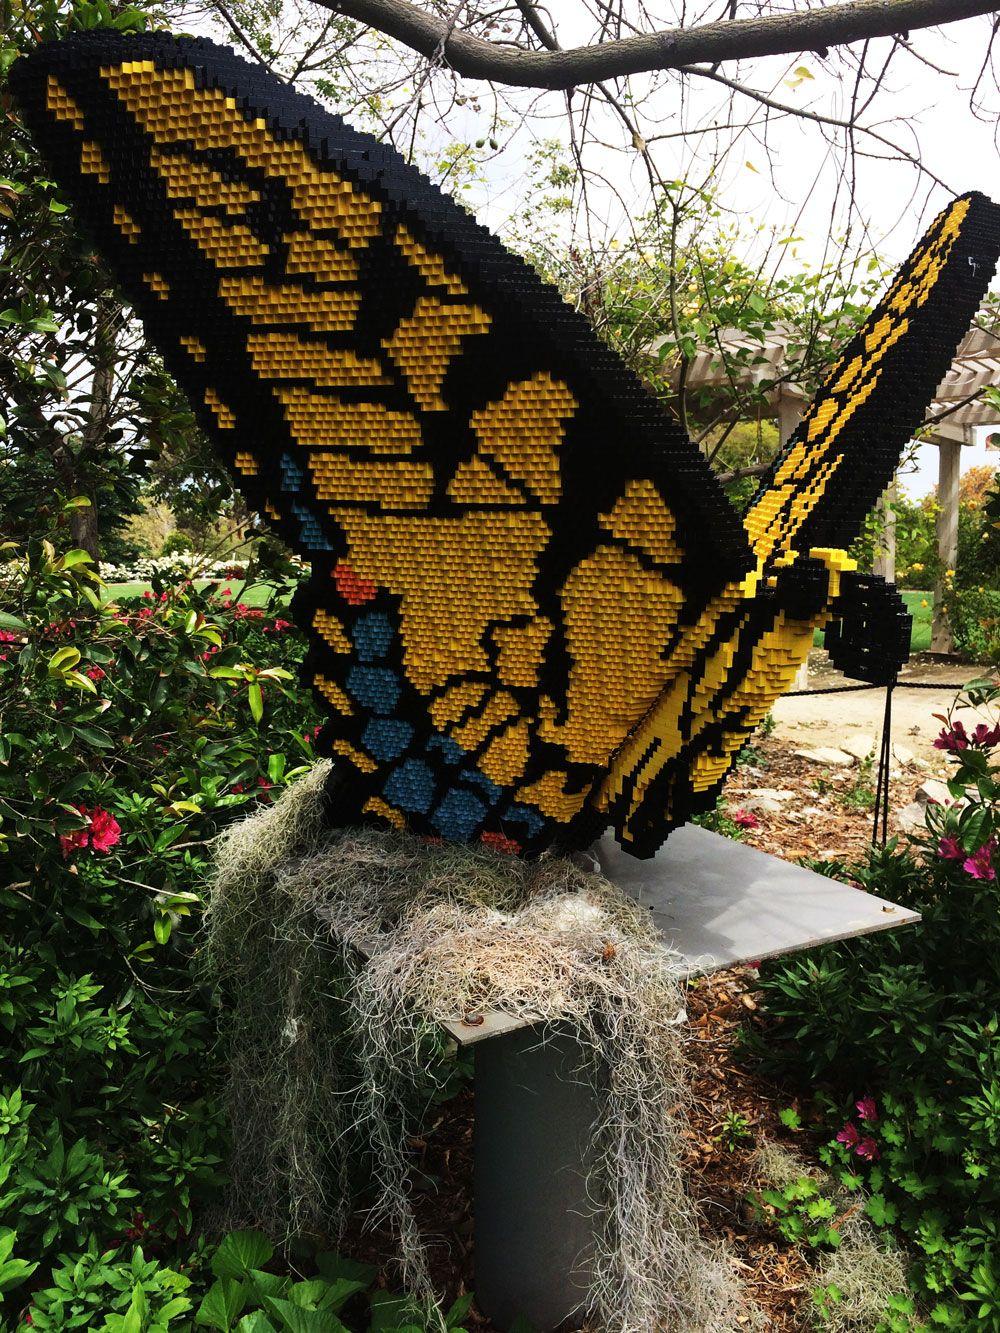 South Coast Botanic Gardens Nature Connects Exhibition